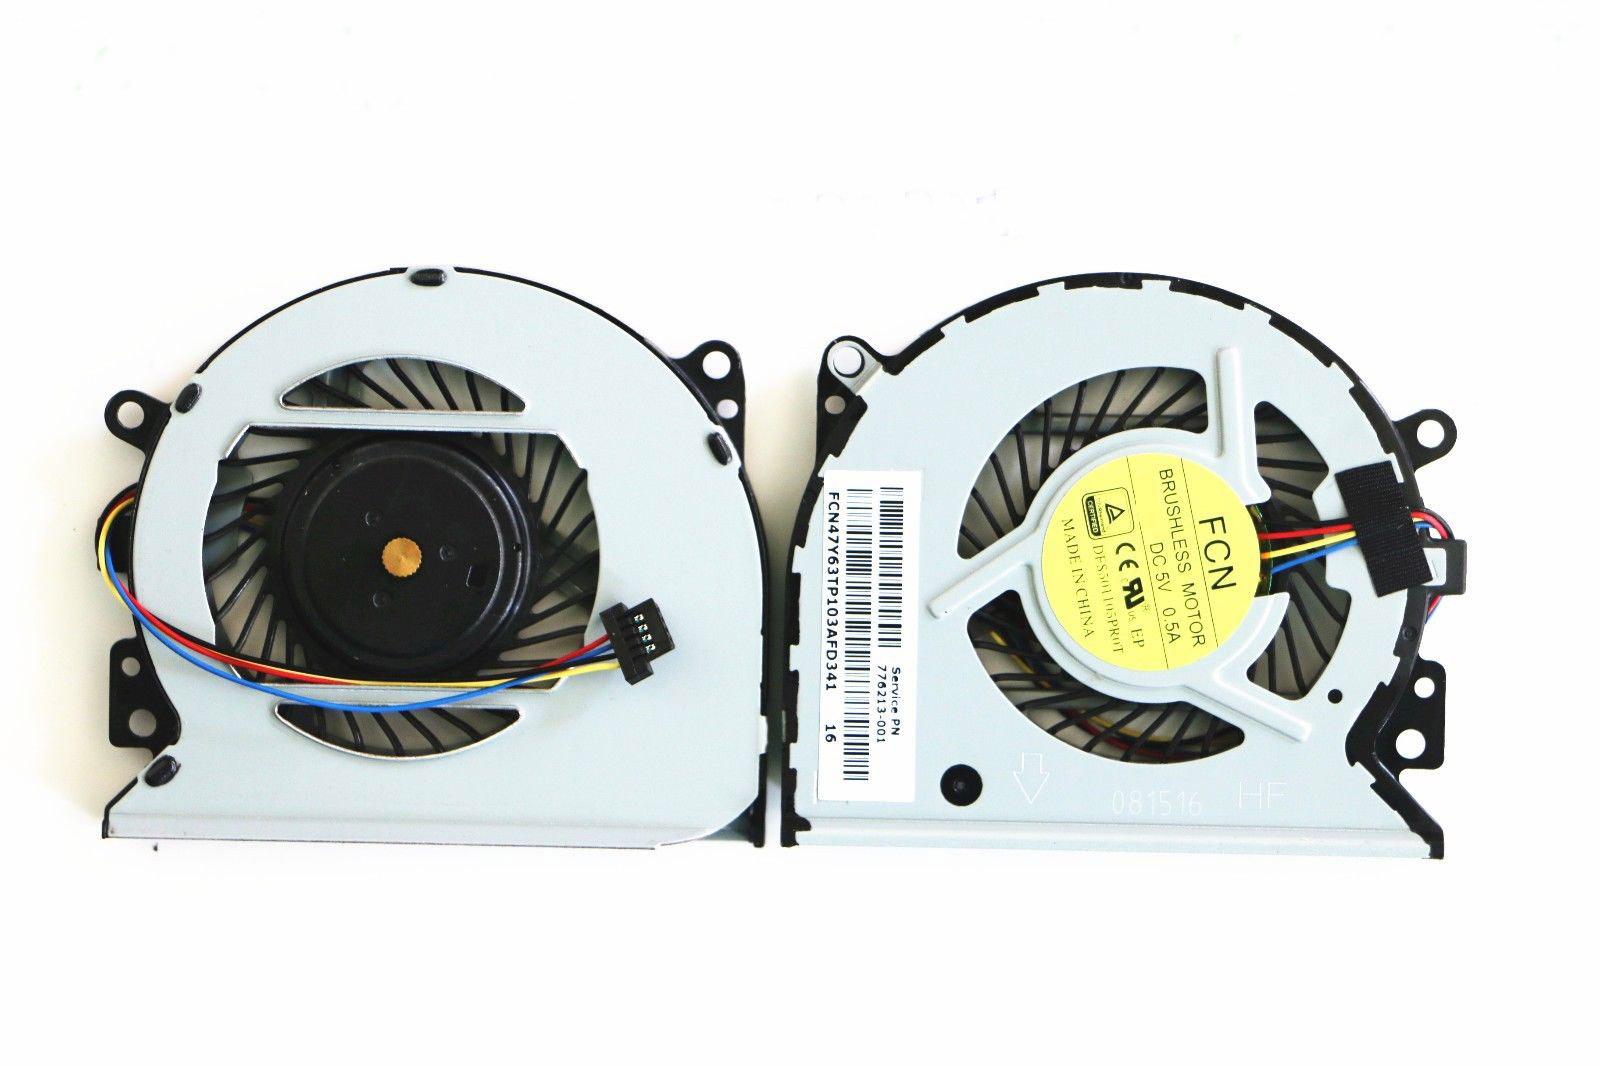 Ventilátor chlazení pro HP Envy 15-U 15-U000 15-U011D 15-U010DX 15-U483CL